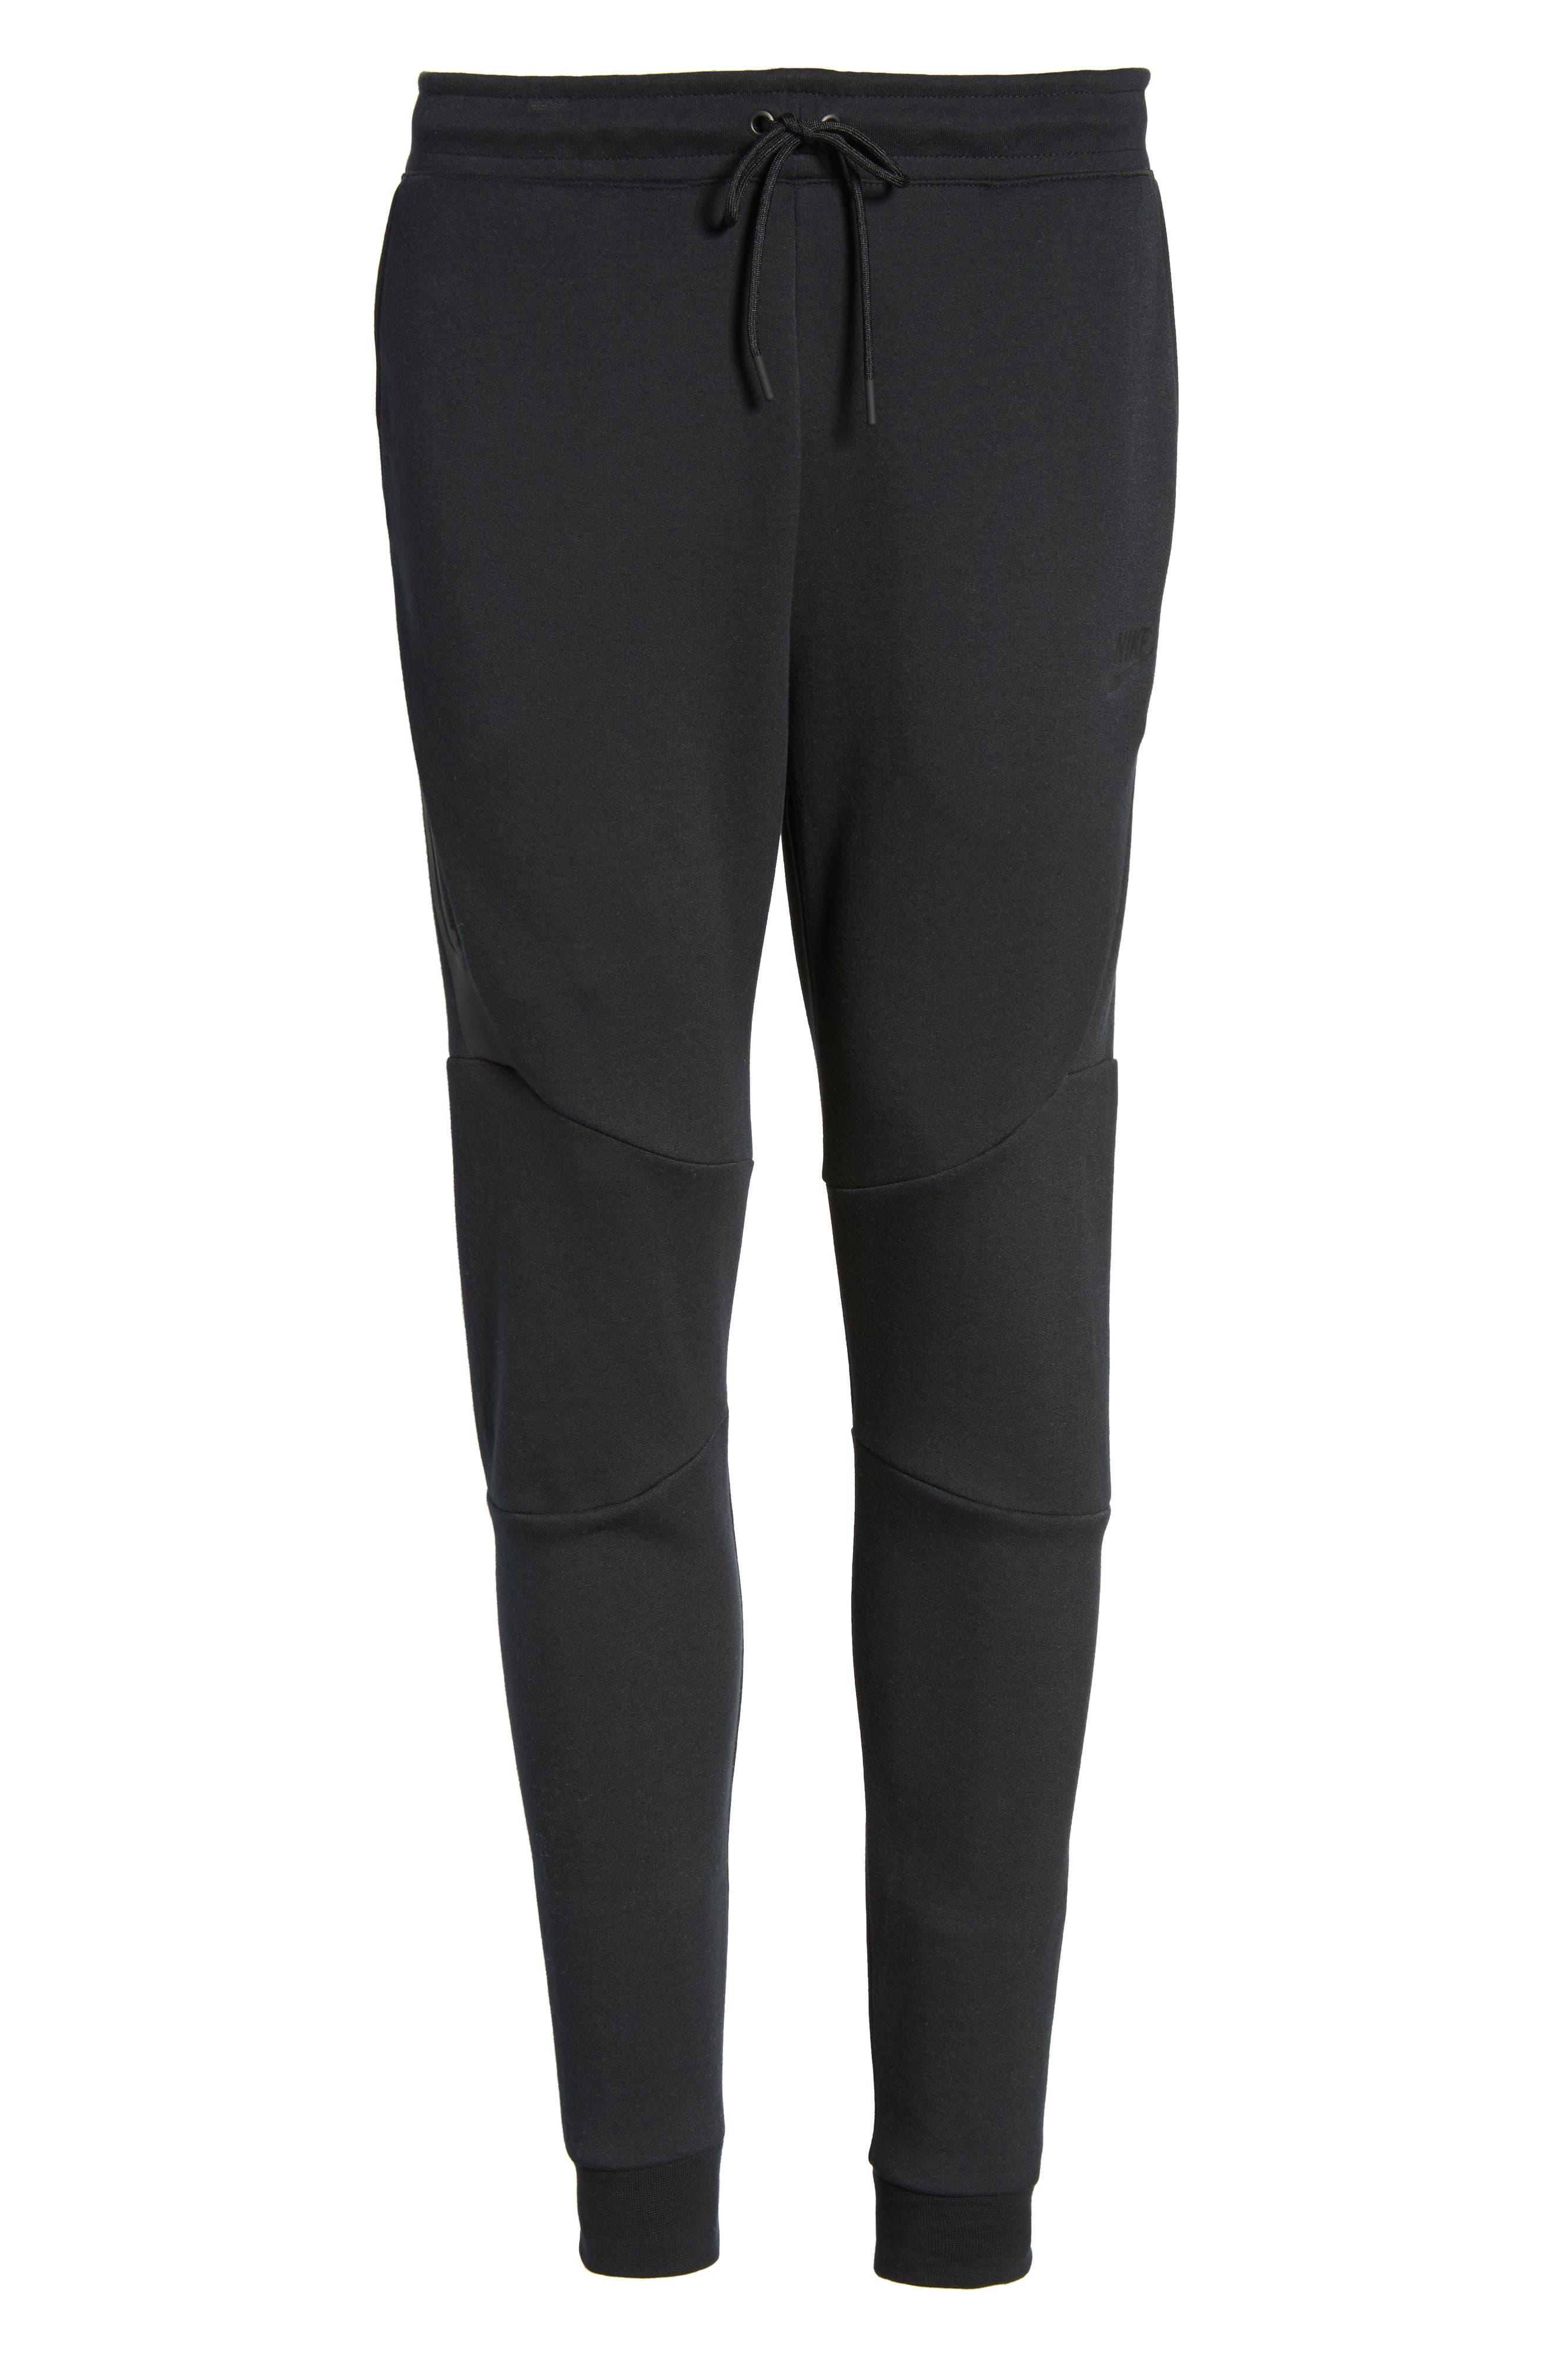 Tech Fleece Jogger Pants,                             Alternate thumbnail 7, color,                             Black/ Black